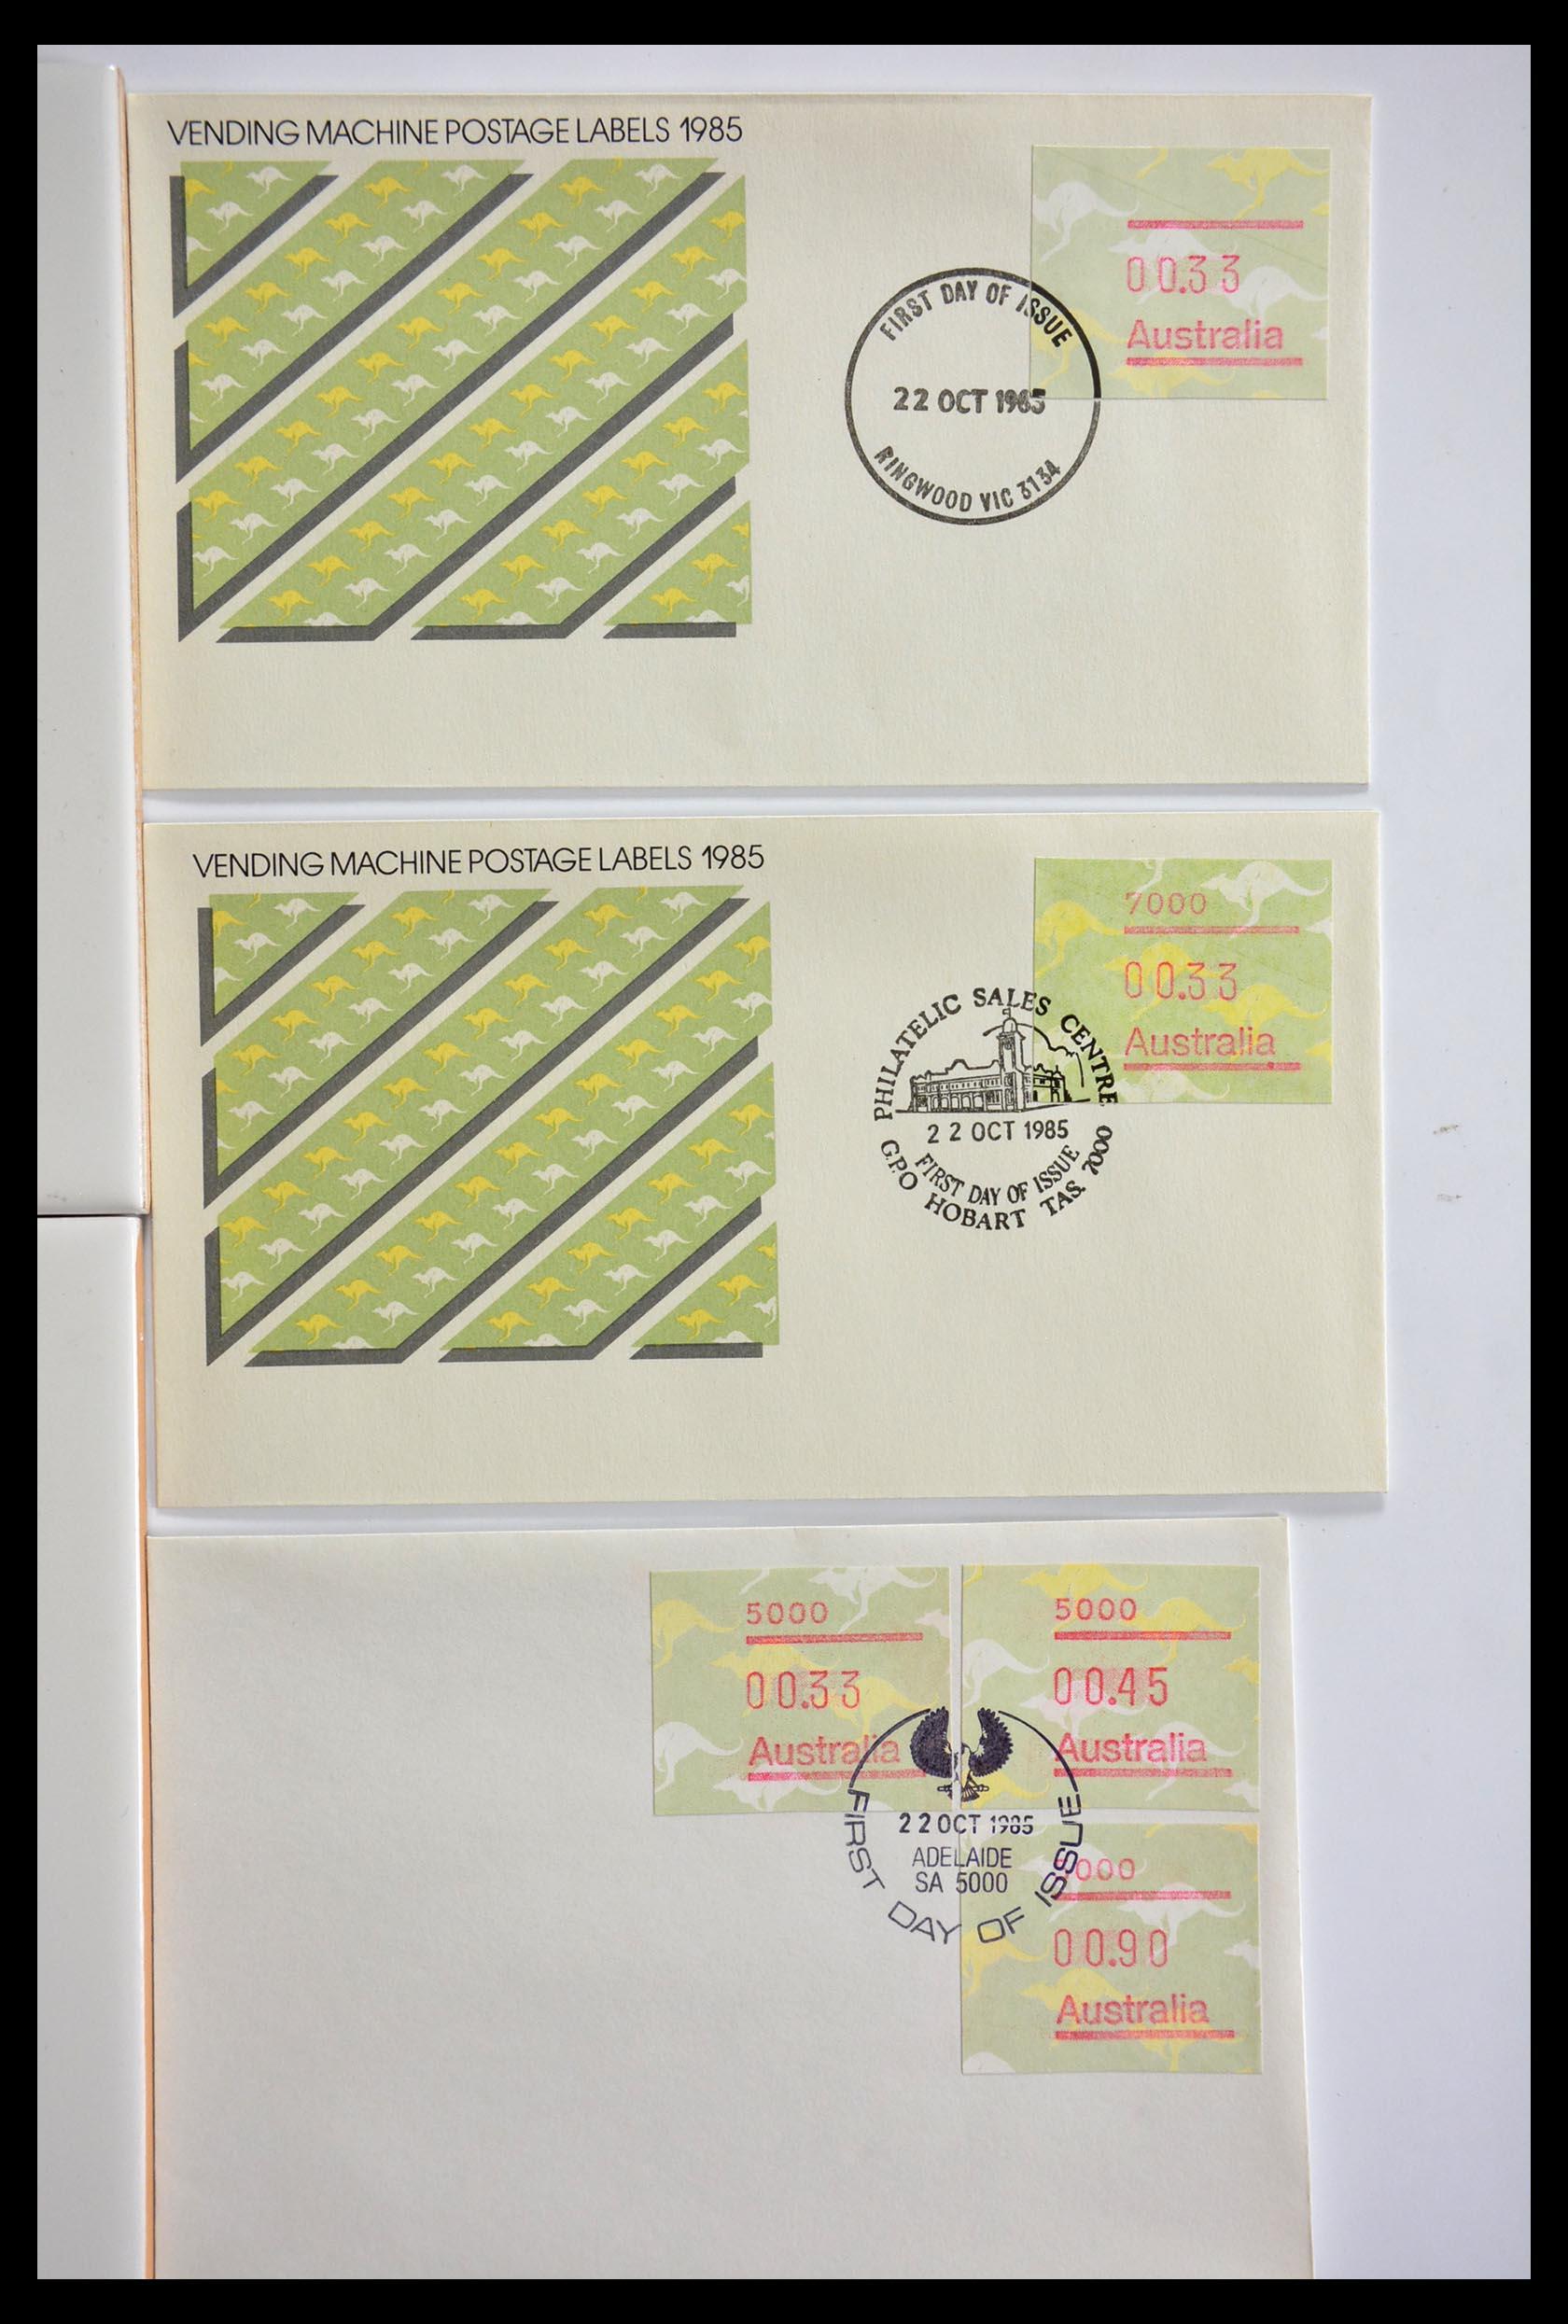 29353 005 - 29353 West Europa automaatzegels.